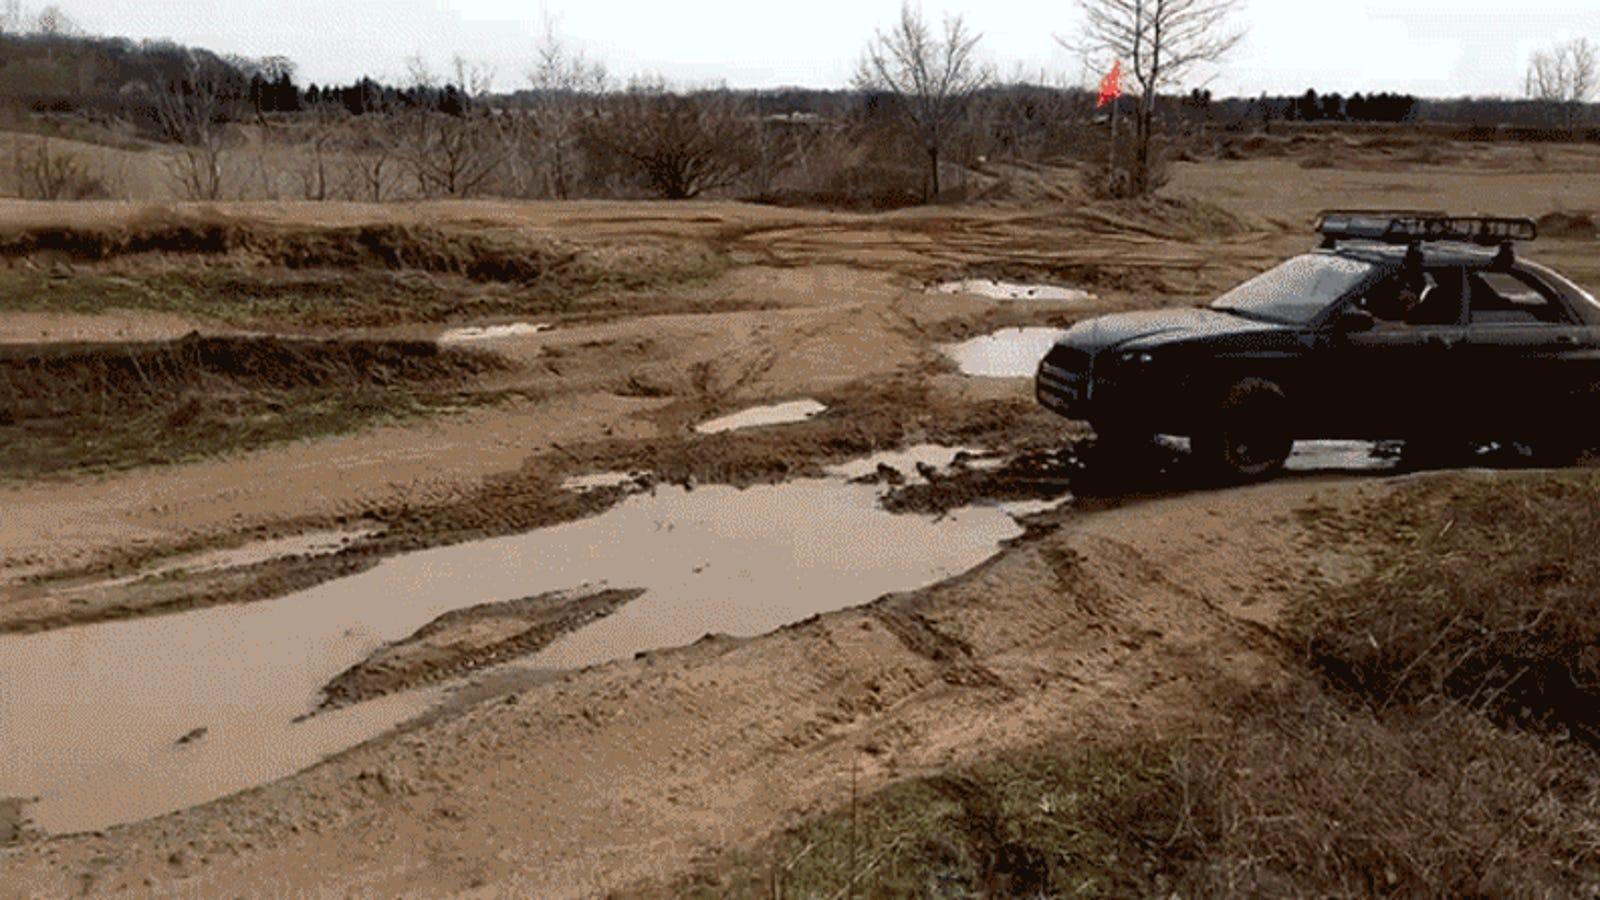 The Insane Lifted Go-Anywhere Subaru Impreza 2 5 RS That